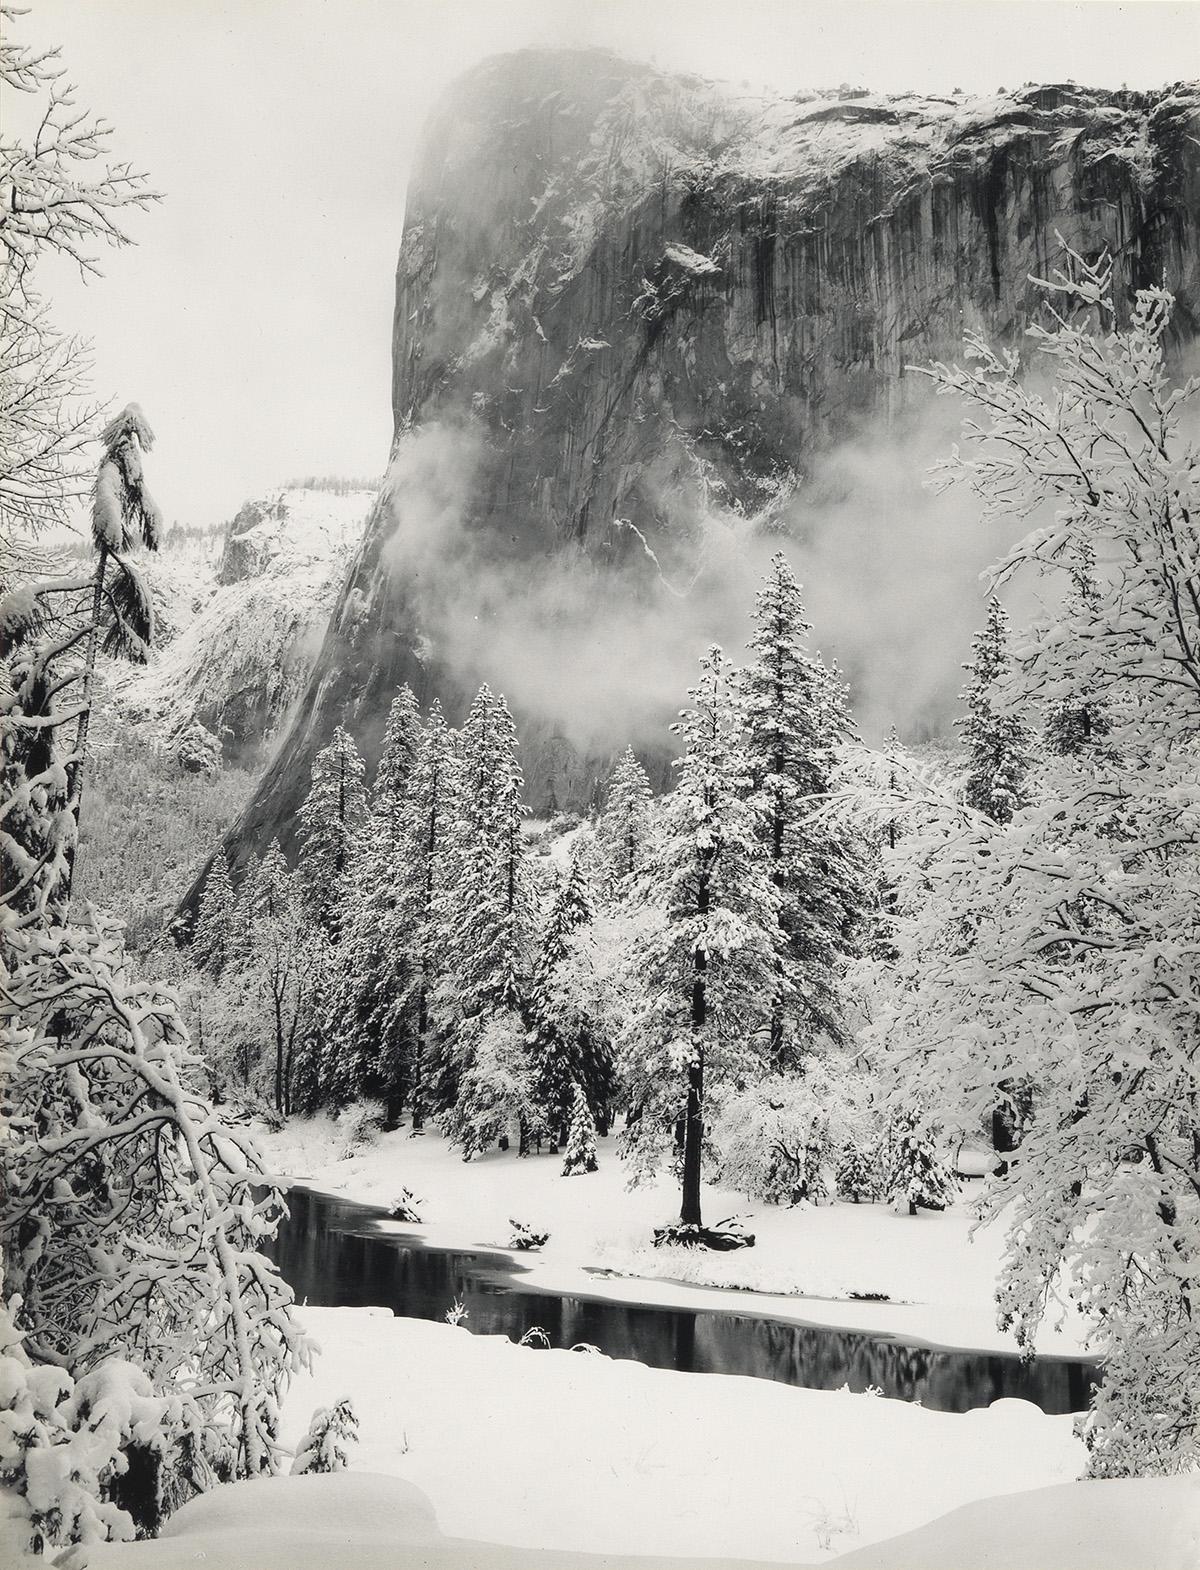 ANSEL-ADAMS-(1902-1984)-El-Capitan-Winter